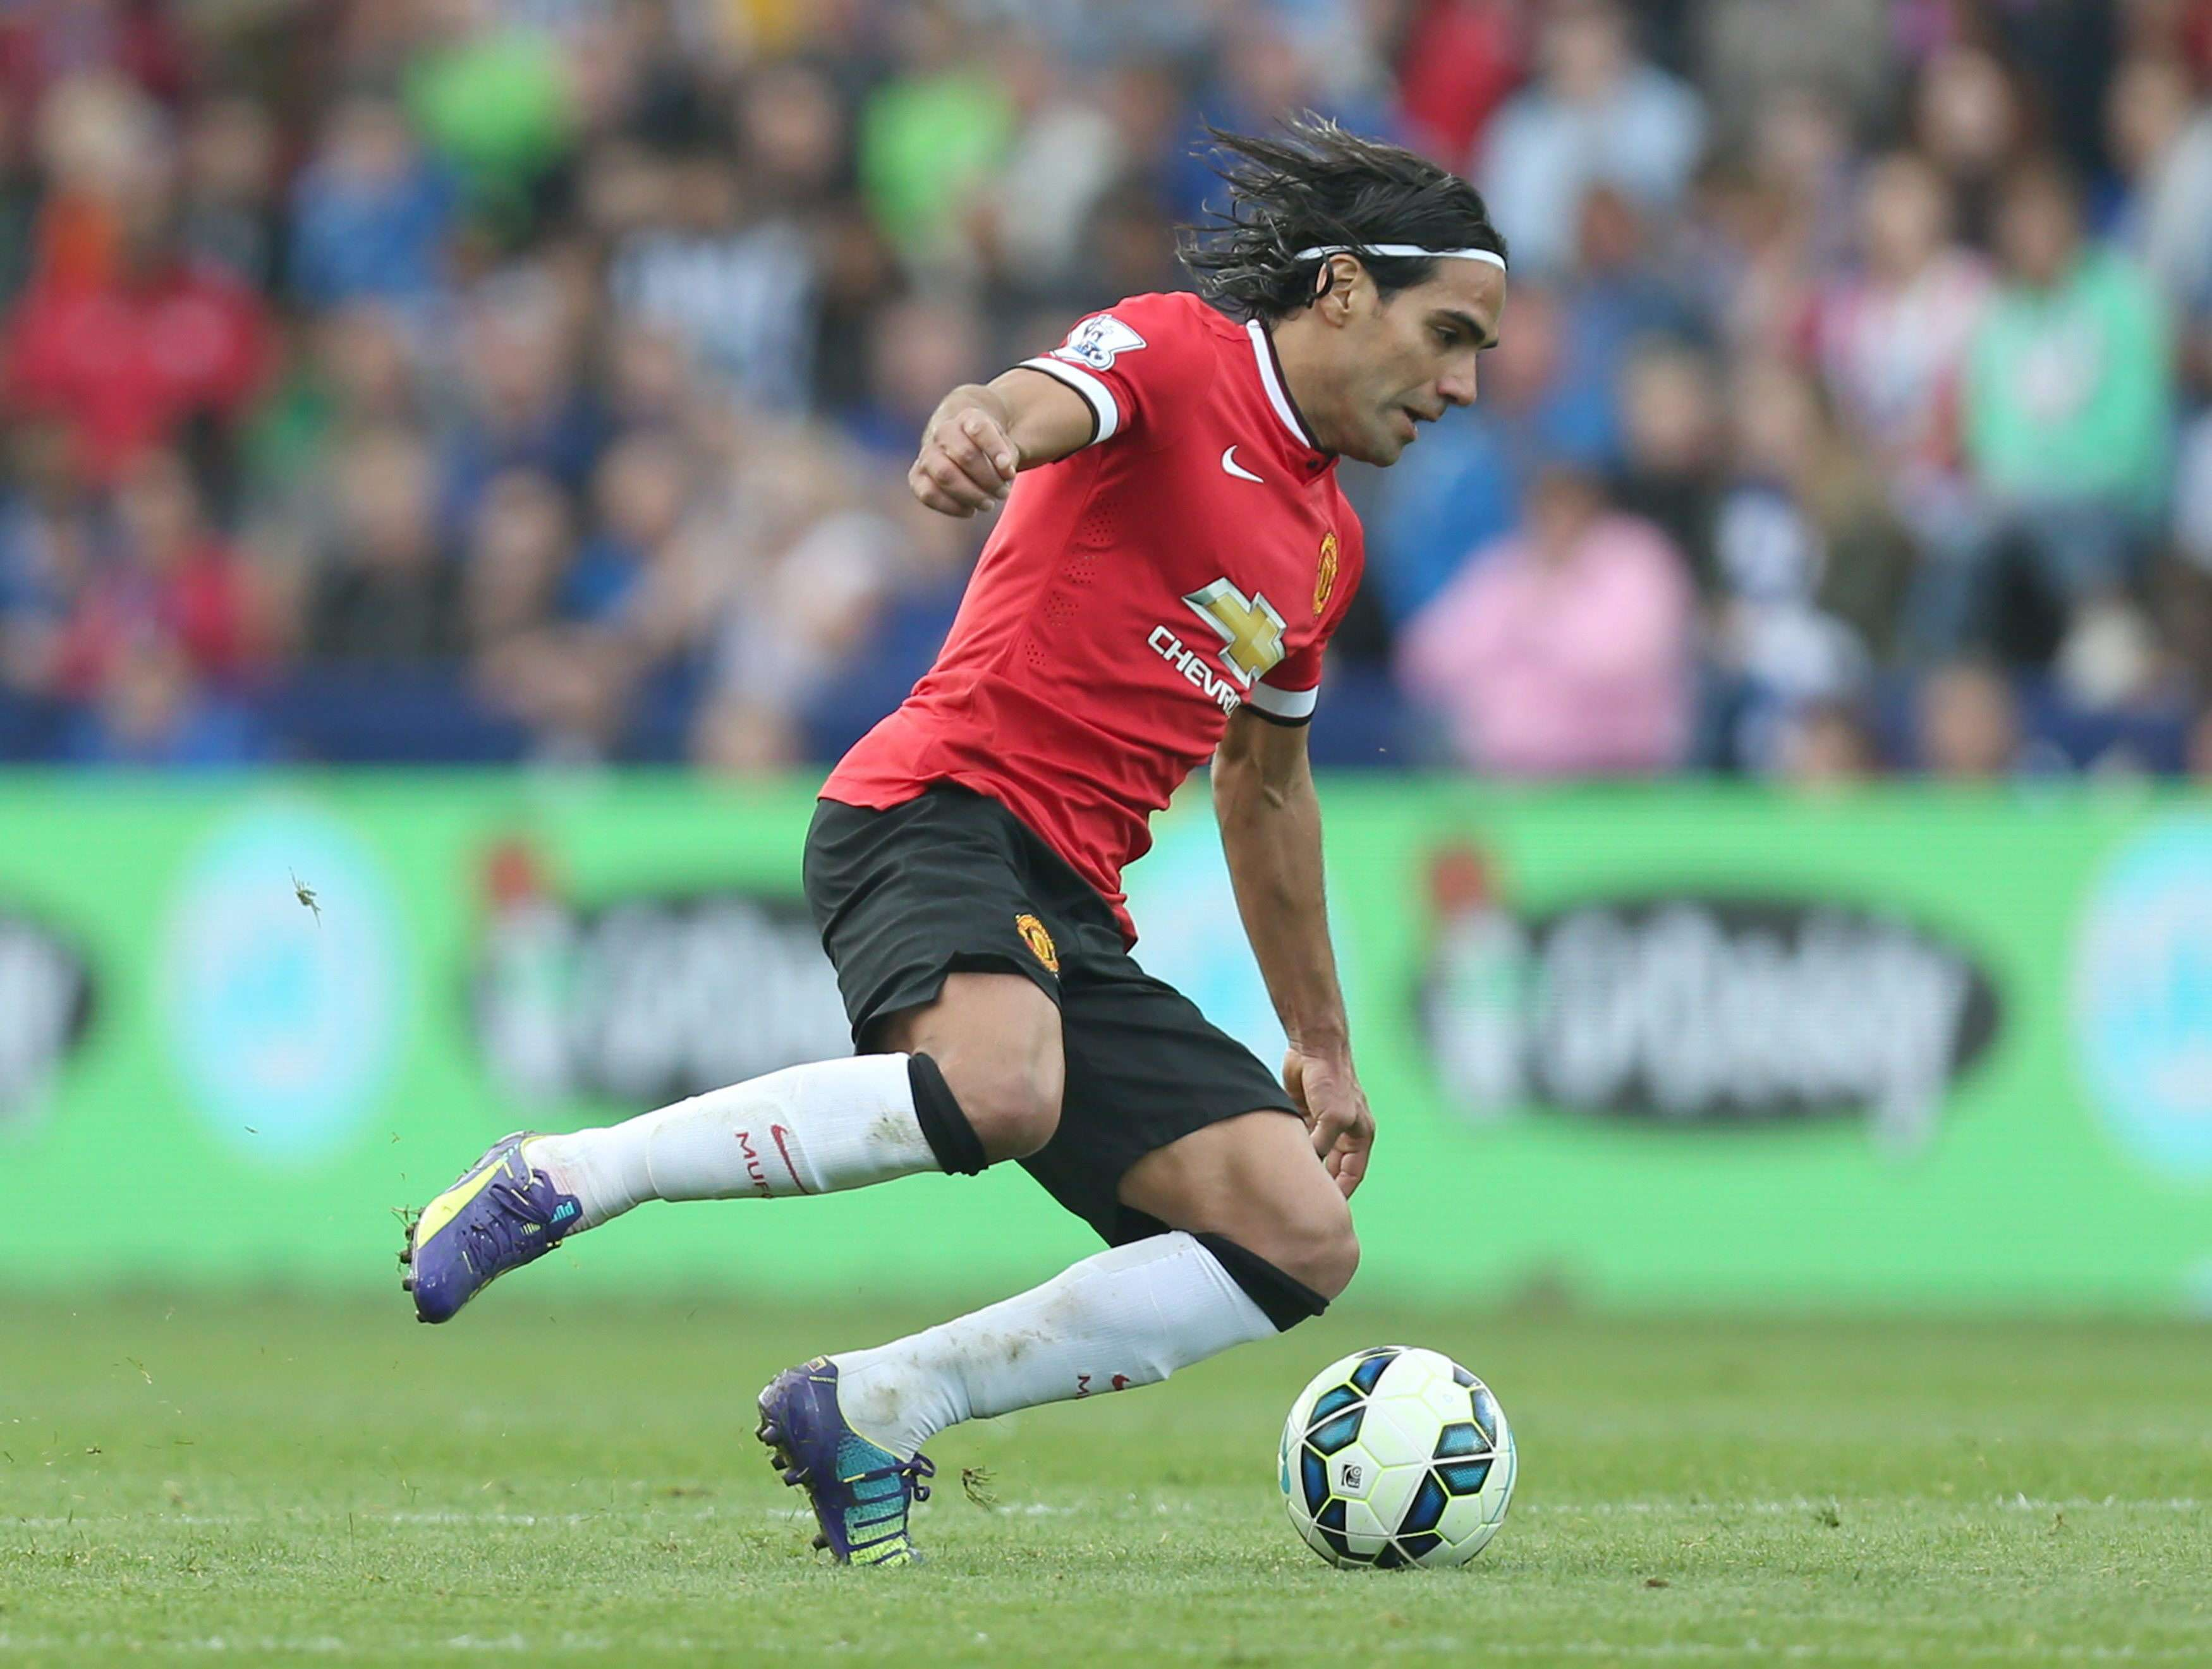 Falcao con el Manchester United. Foto: EFE